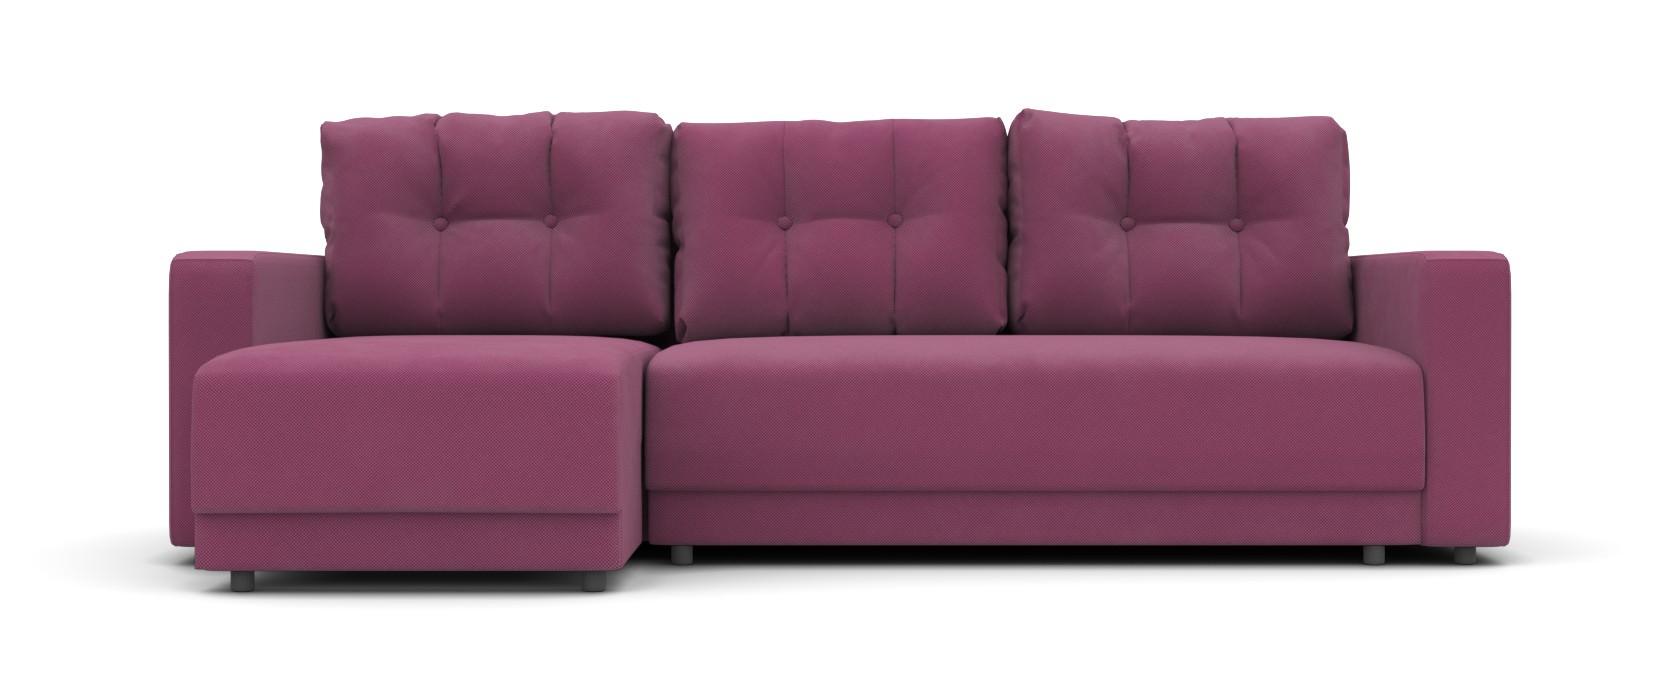 Кутовий диван Famiglia